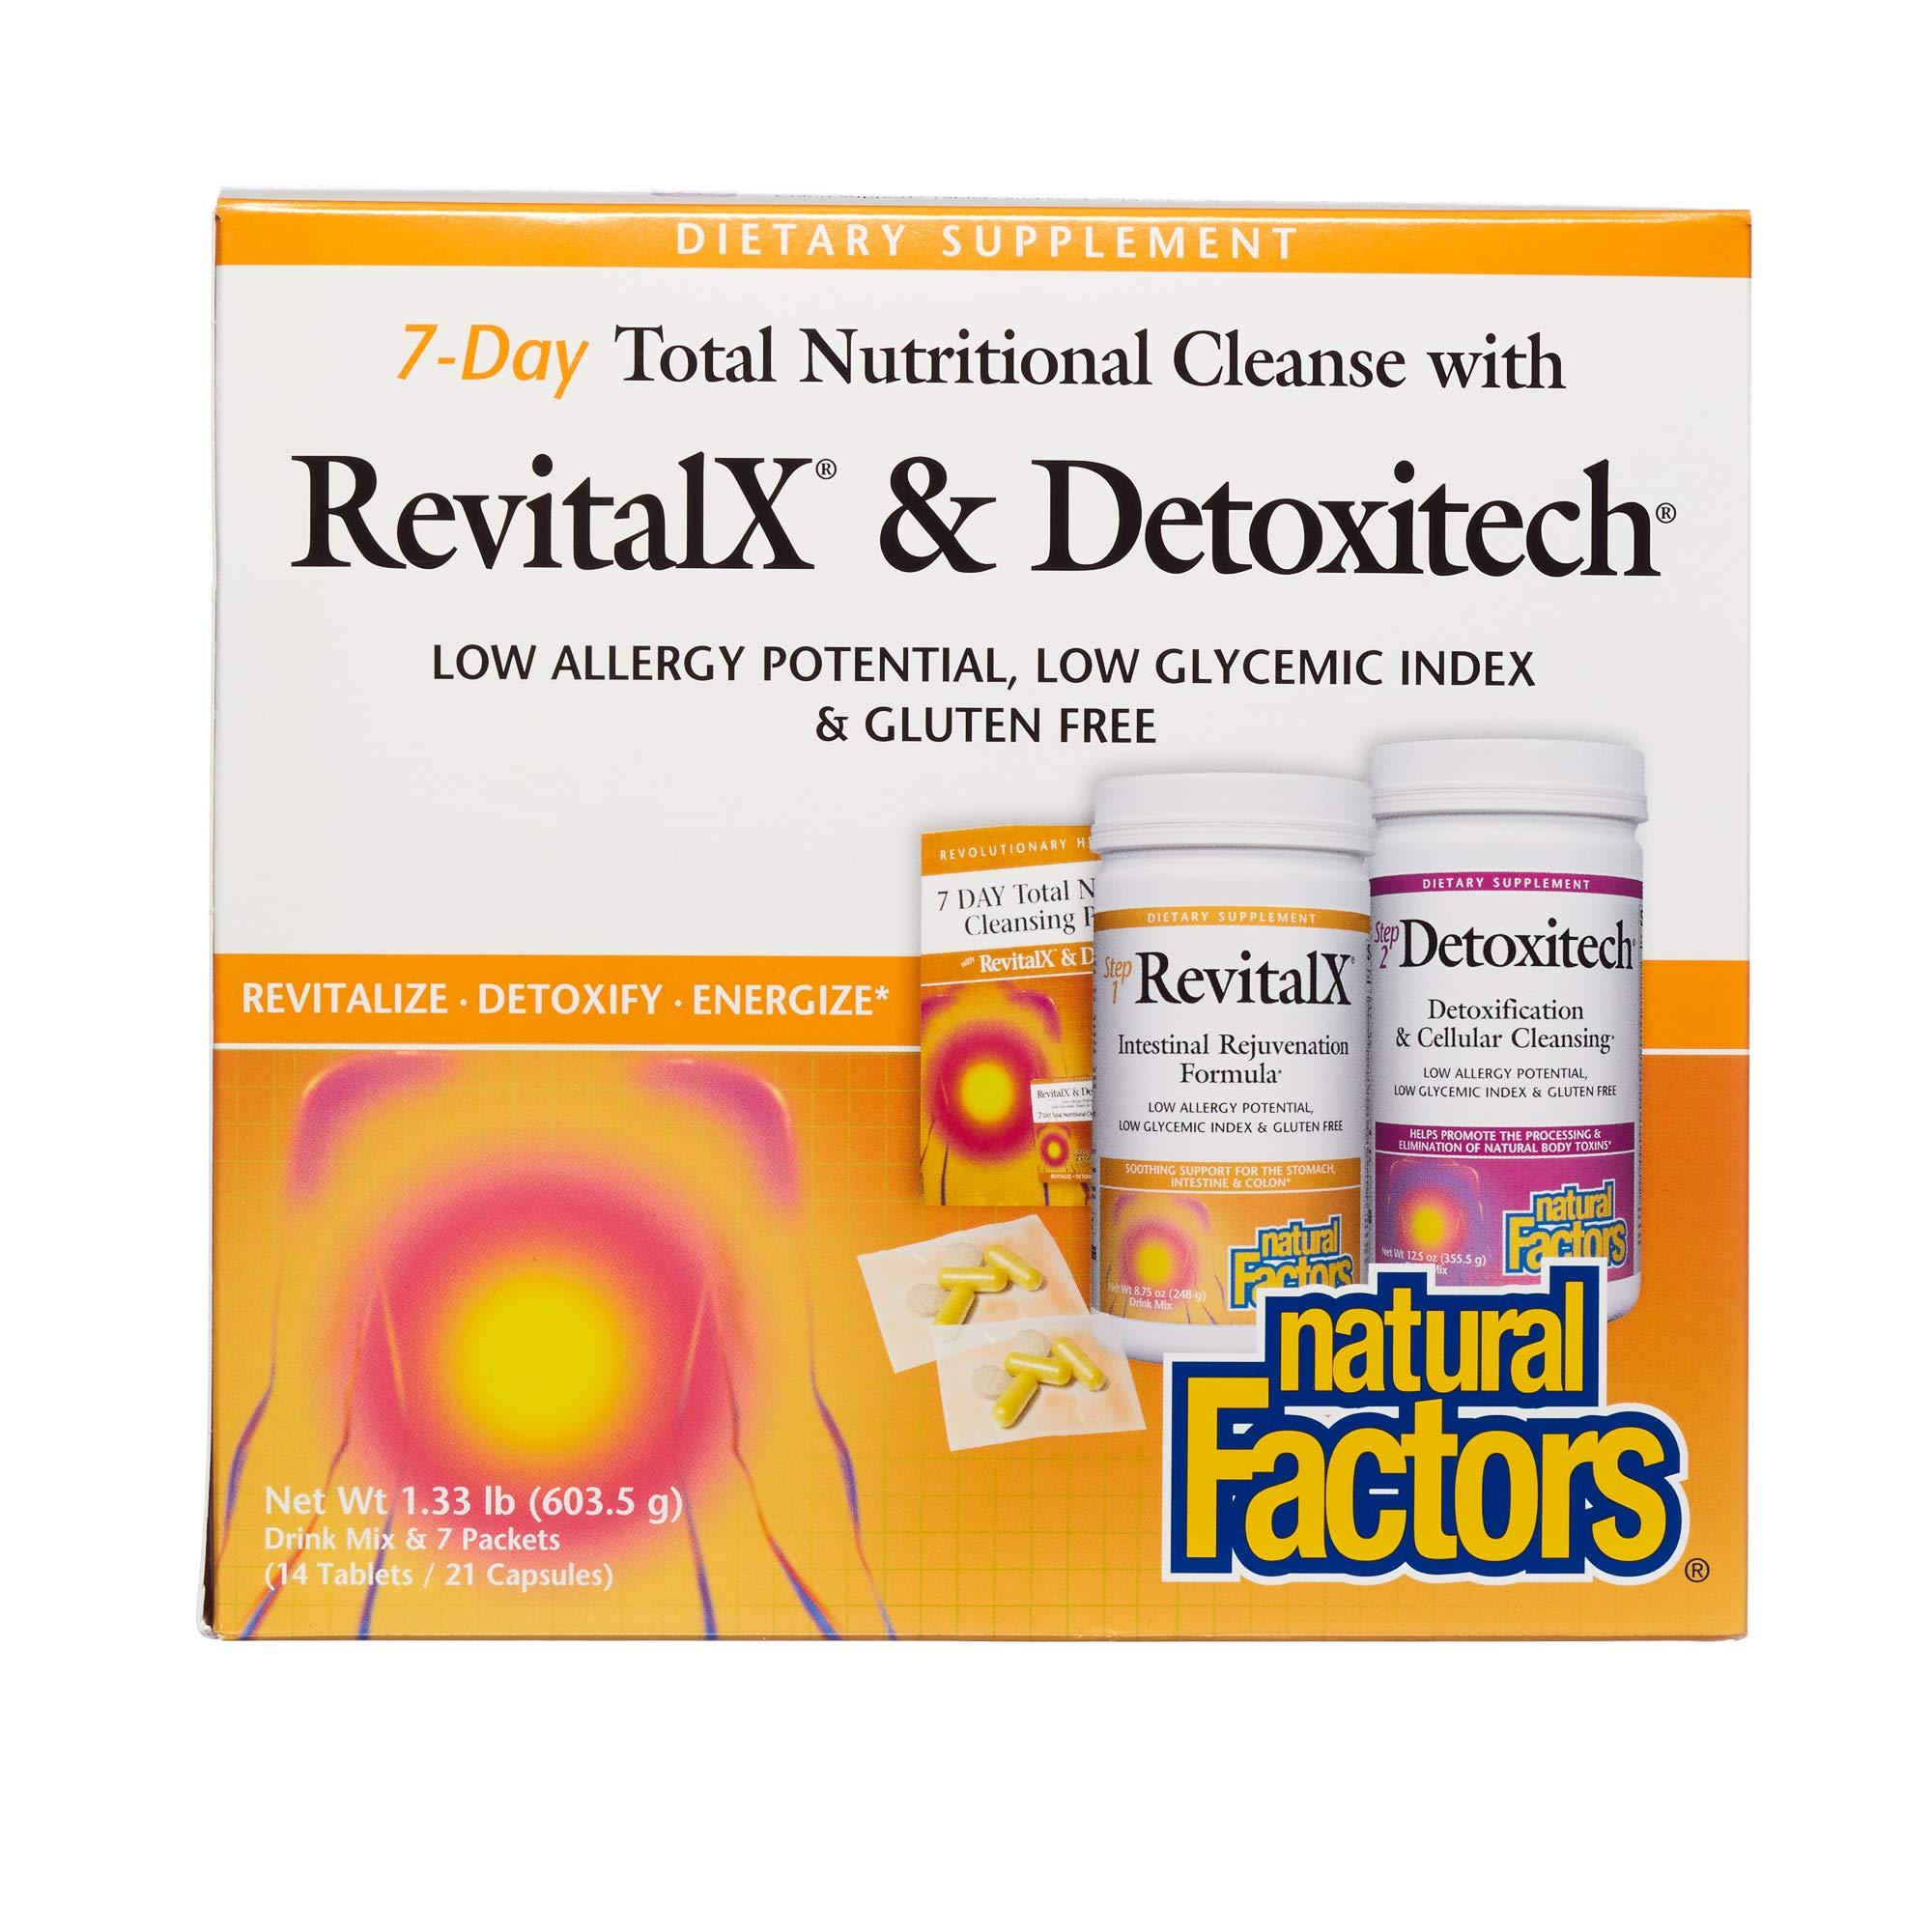 Natural Factors - RevitalX & Detoxitech, 7 Day Total Nutritional Cleansing Program, 7 Day Kit